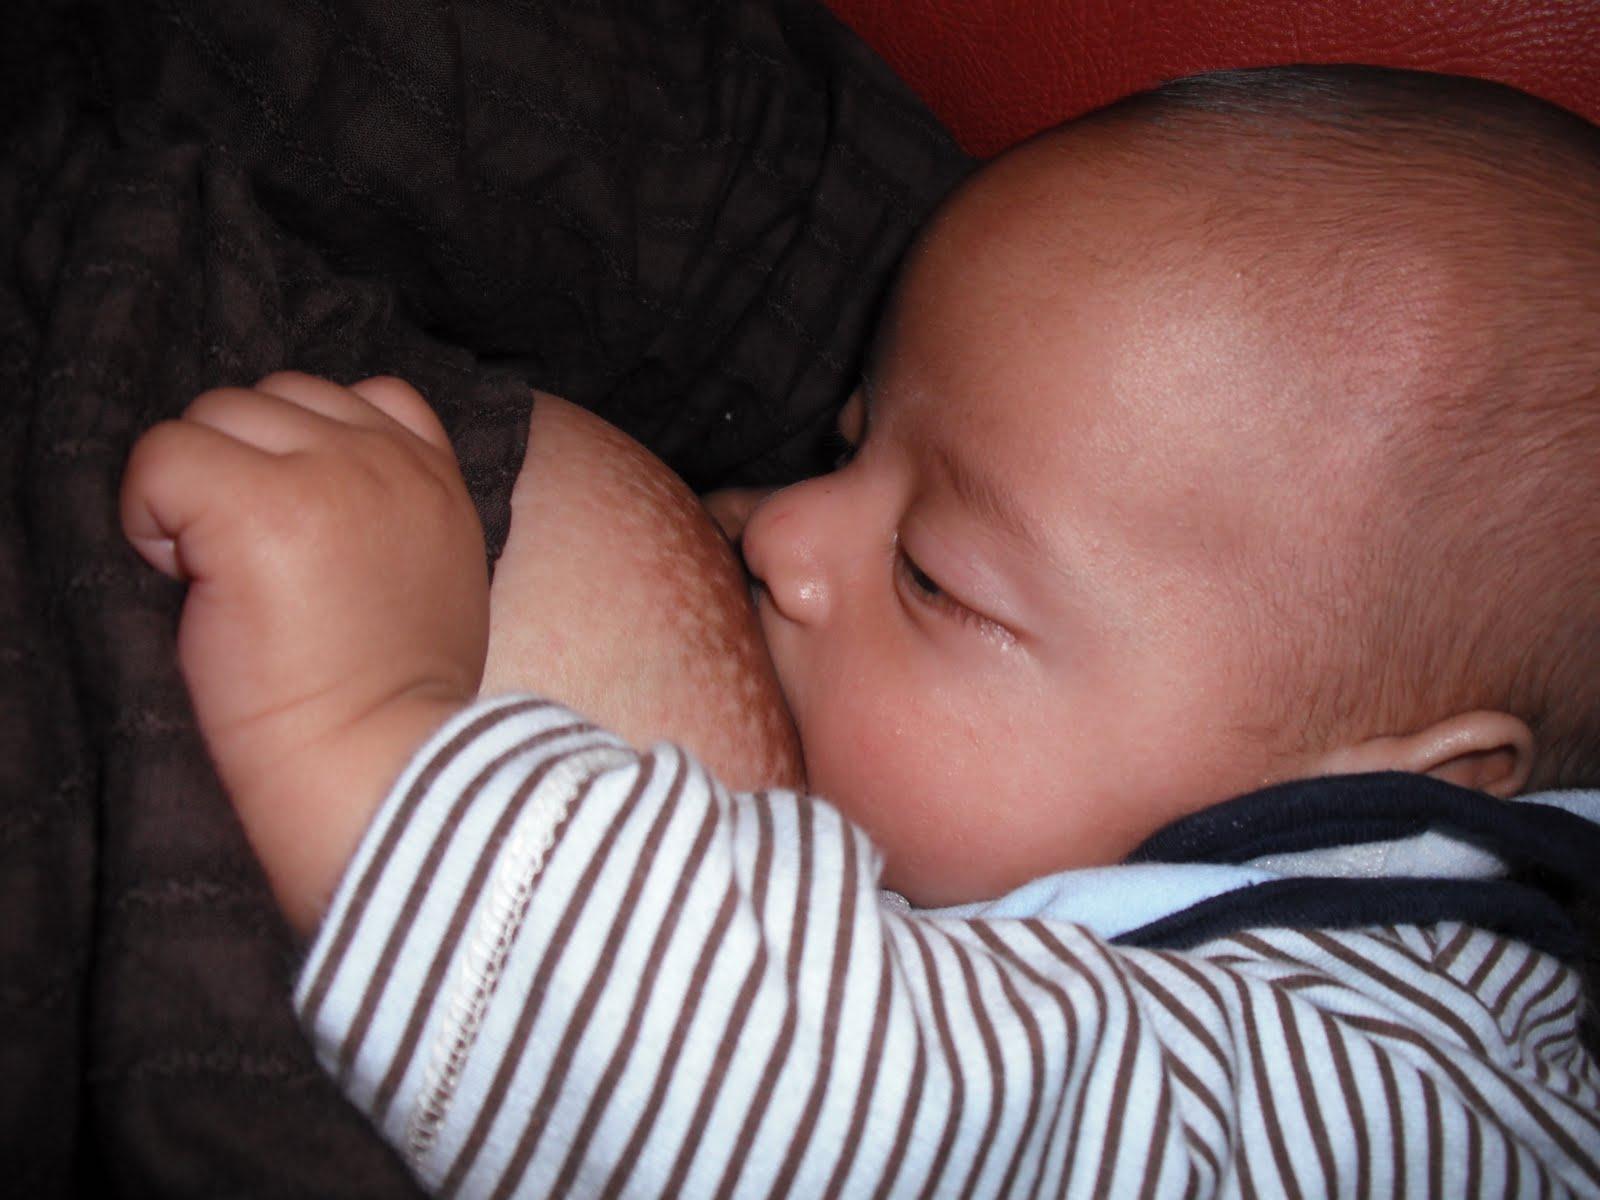 Consejería en Lactancia Materna